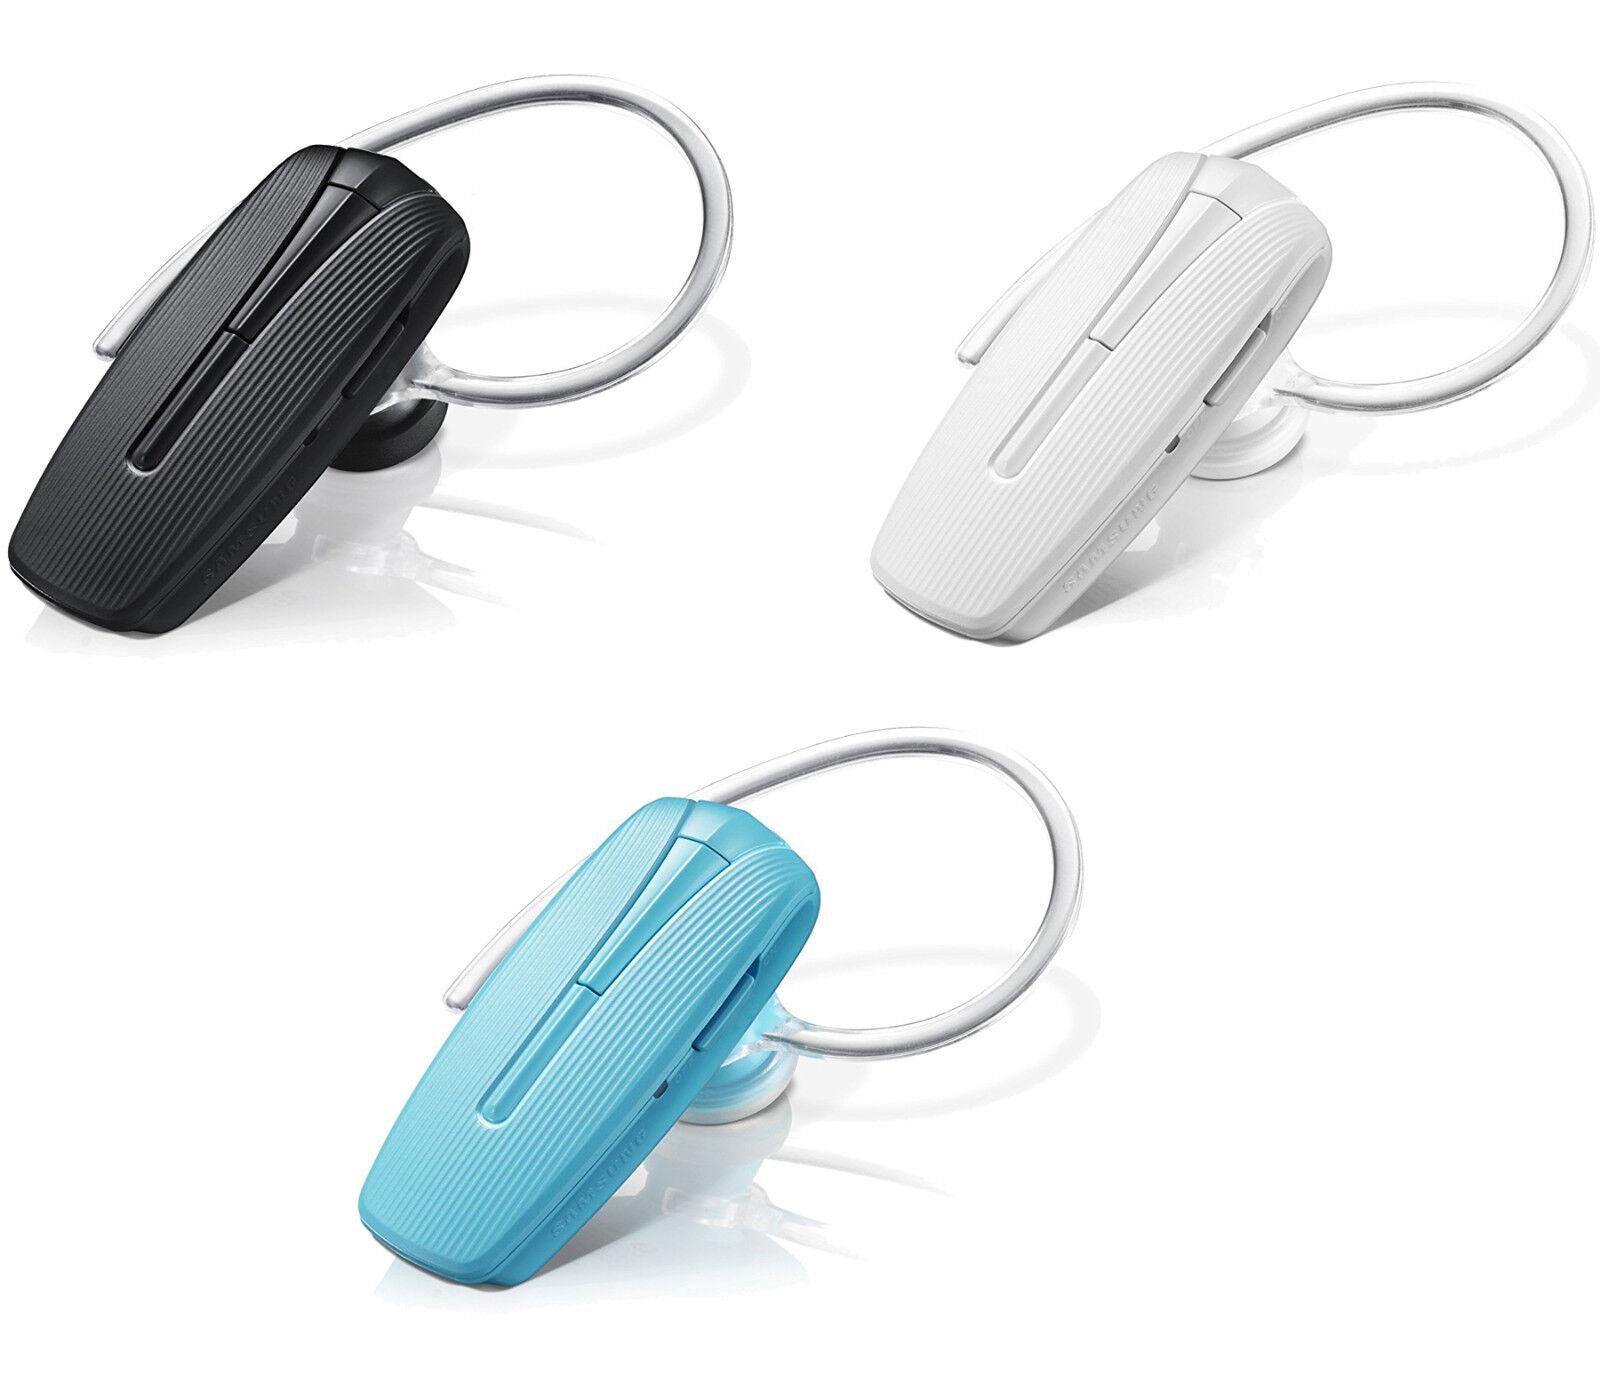 Samsung Wep303 Bluetooth Headset Black For Sale Online Ebay